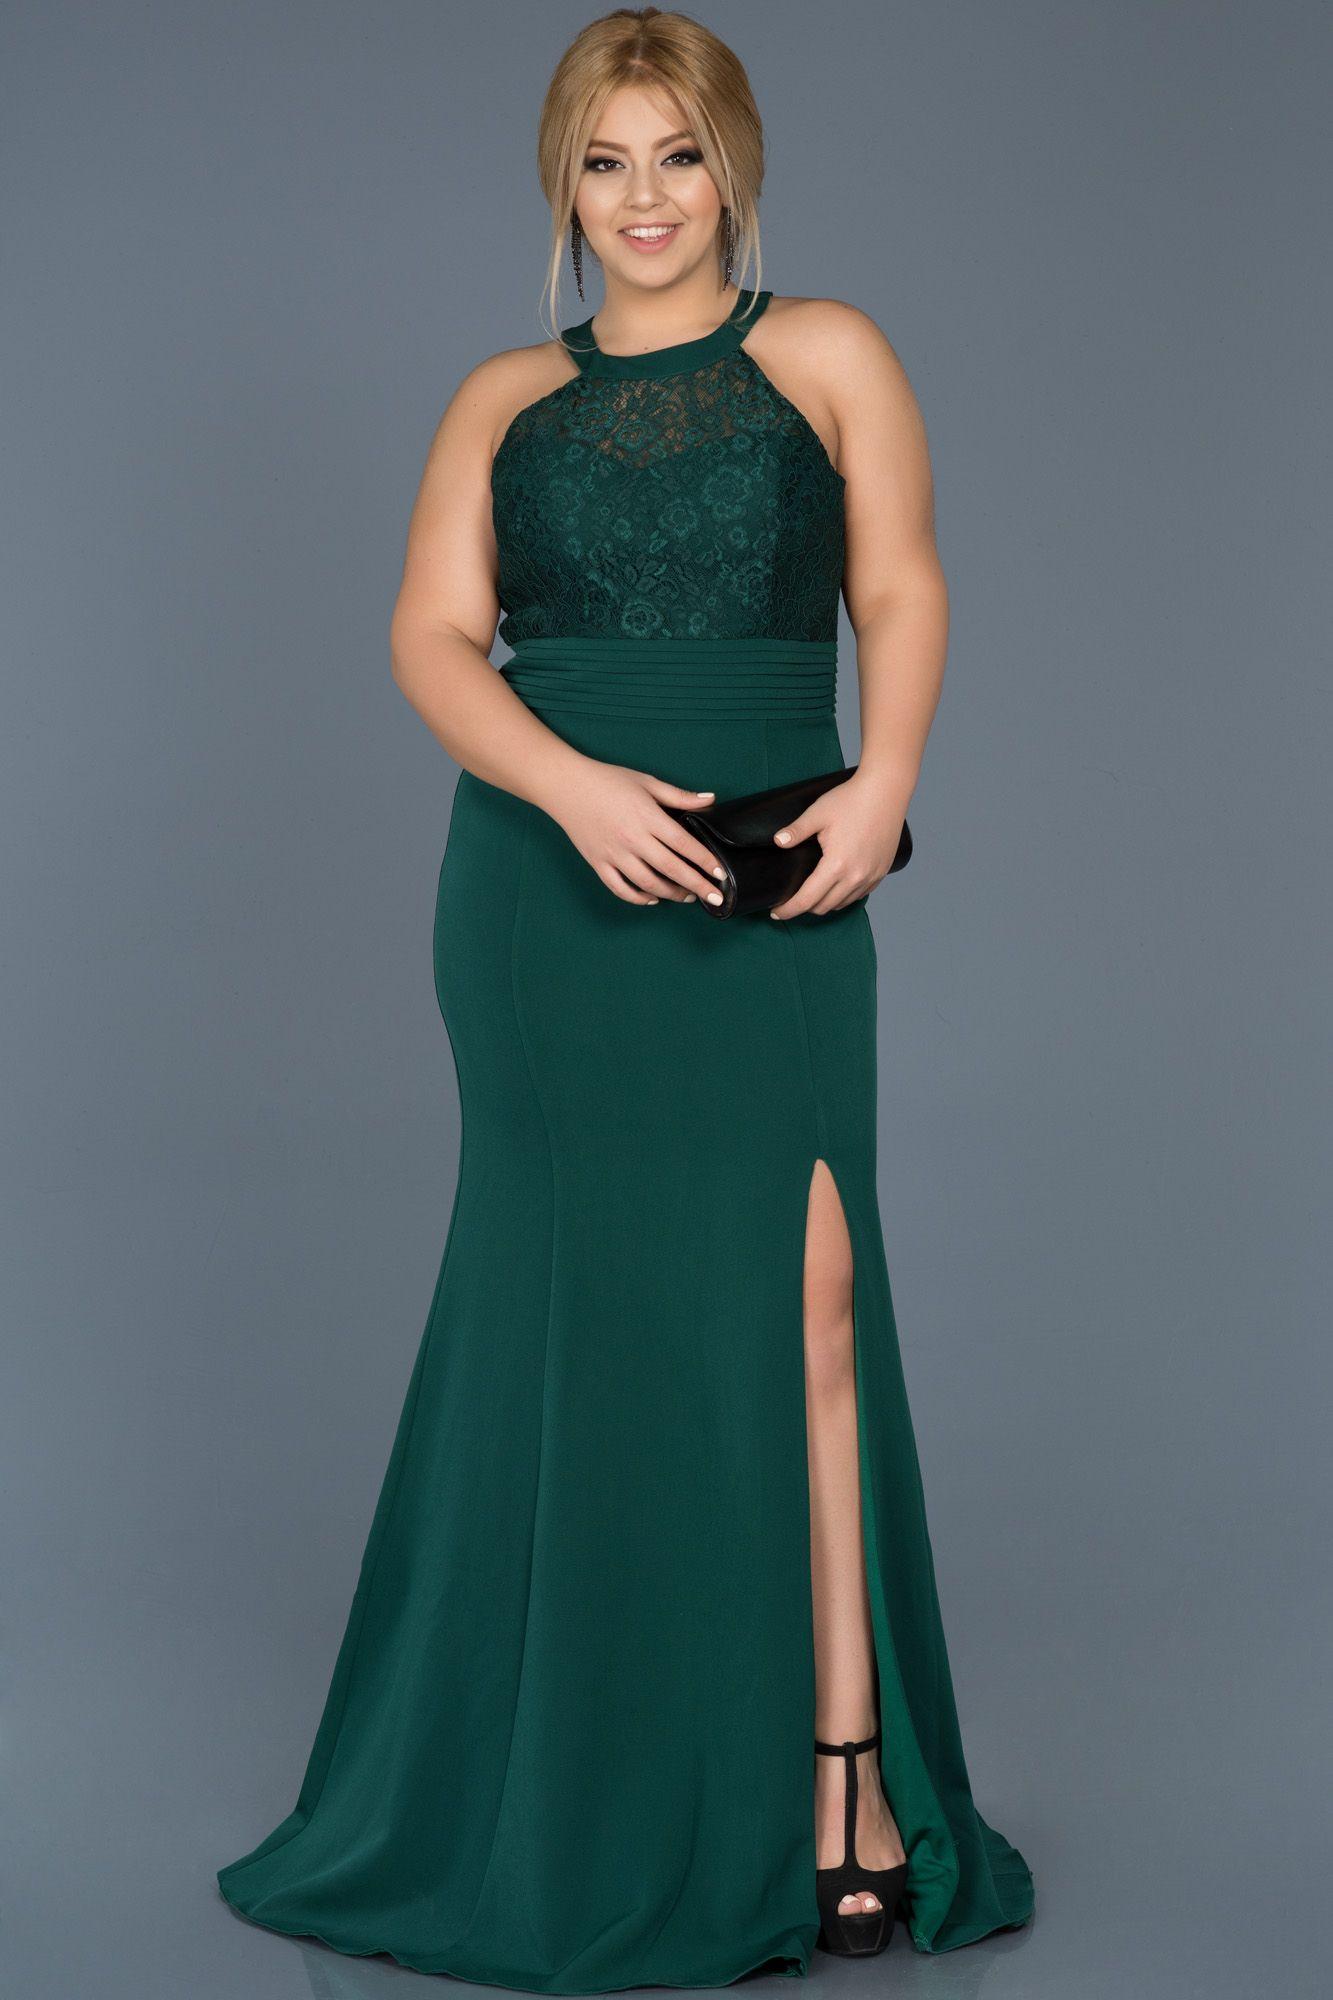 Zumrut Yesili Yirtmacli Buyuk Beden Abiye Abu473 Elbise Modelleri Elbise The Dress